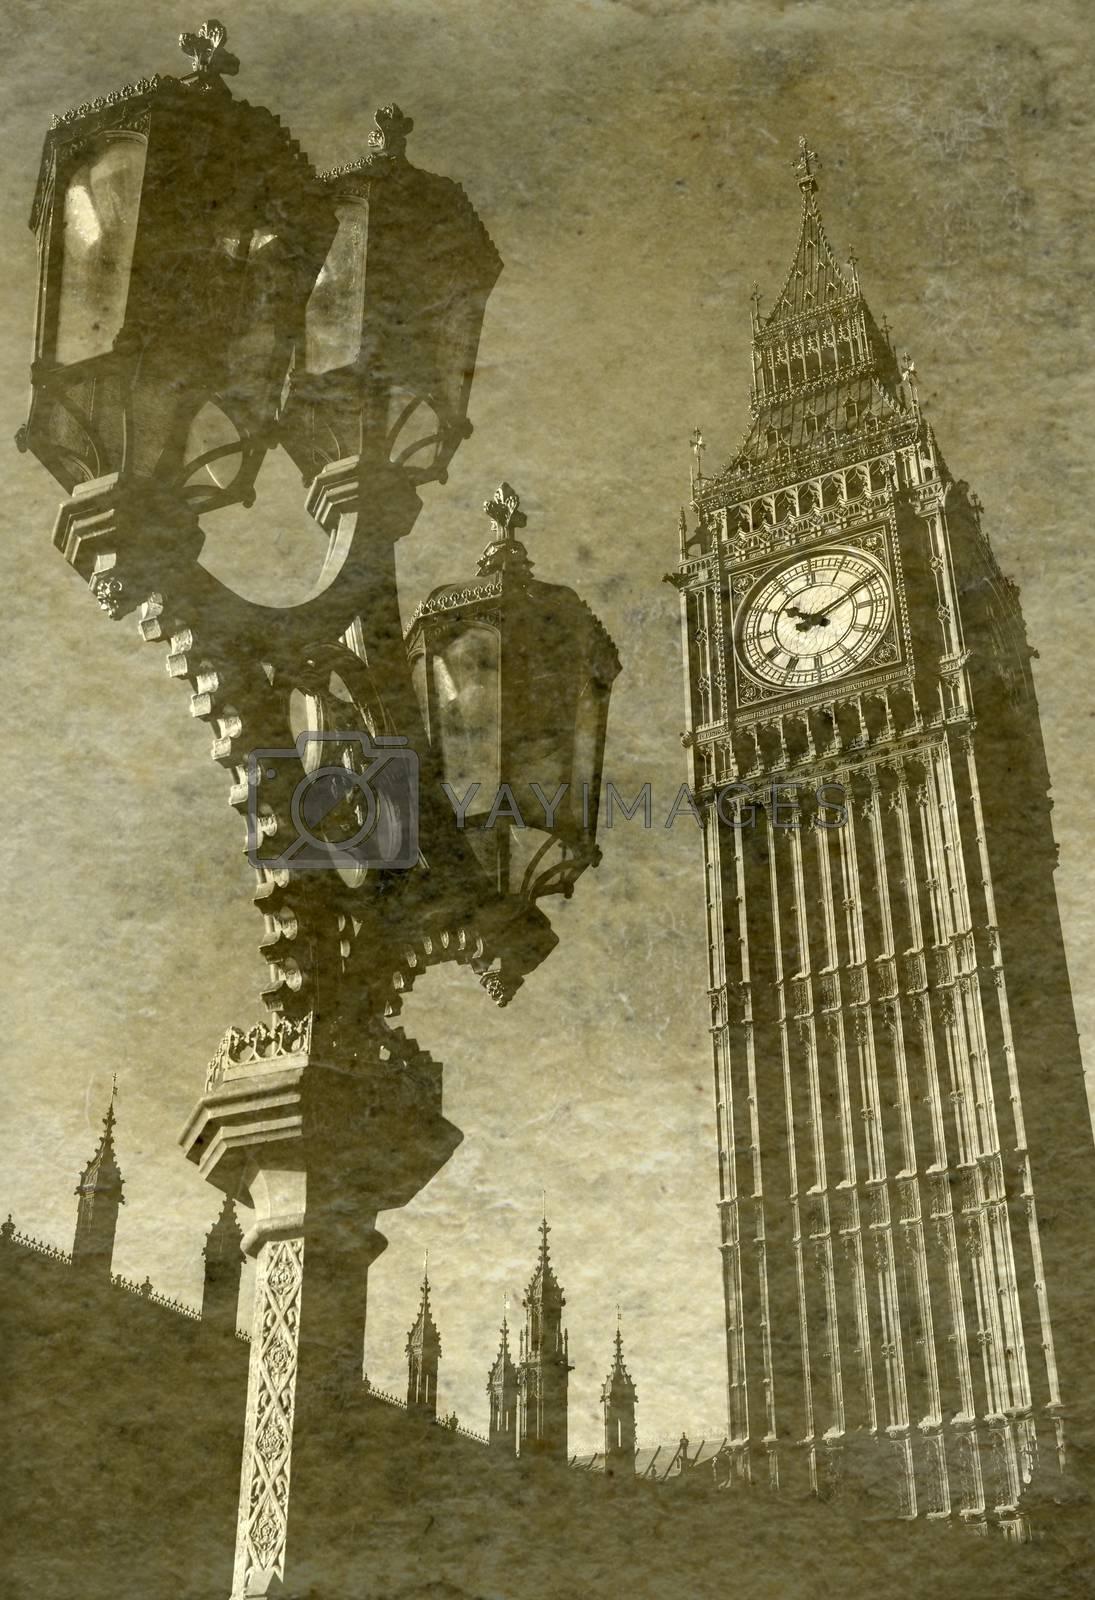 Looking up at Big Ben by chrisdorney